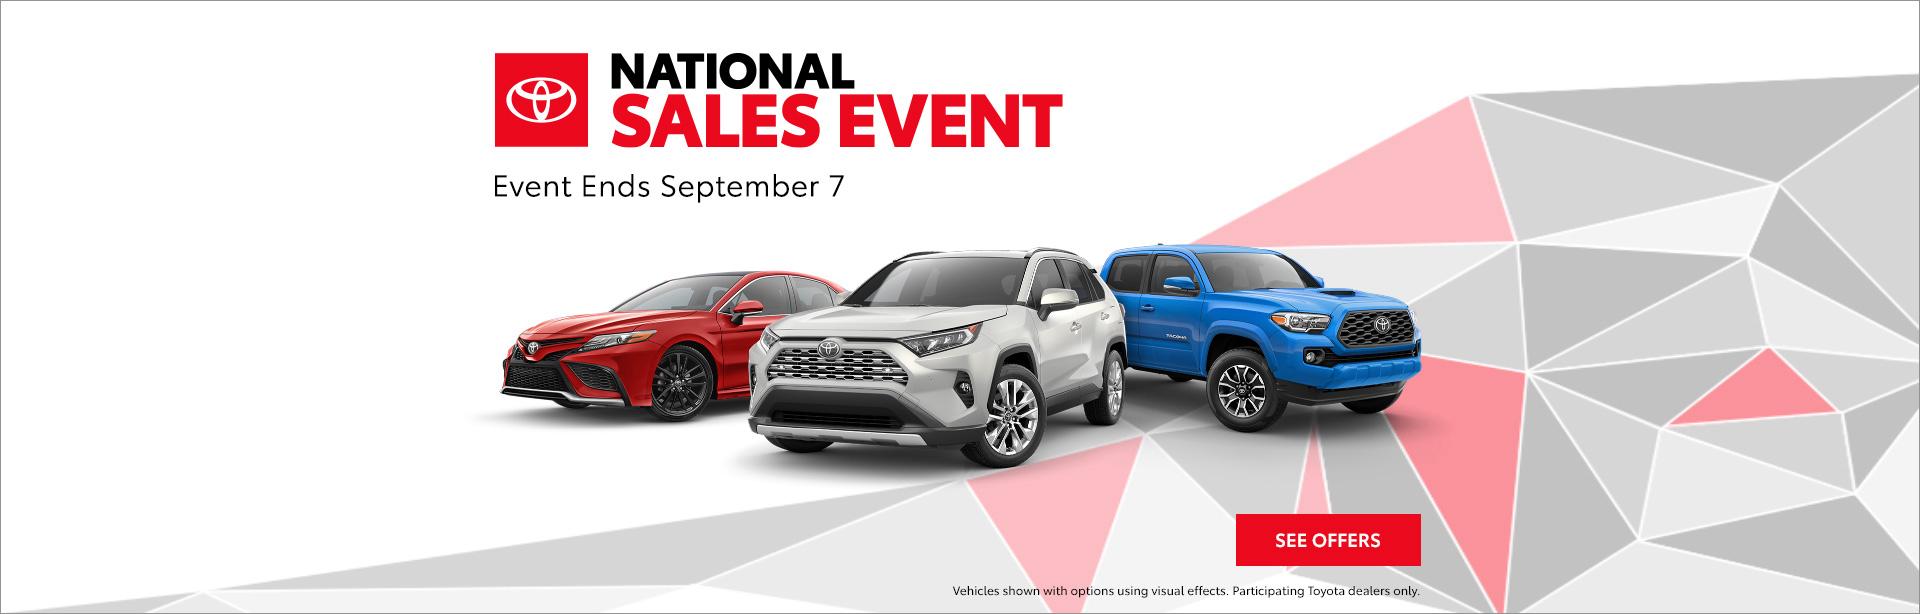 07-21_01_Boston-July-2021-NE-National-Sales_1920x614_d334_Camry_R_xta.jpeg